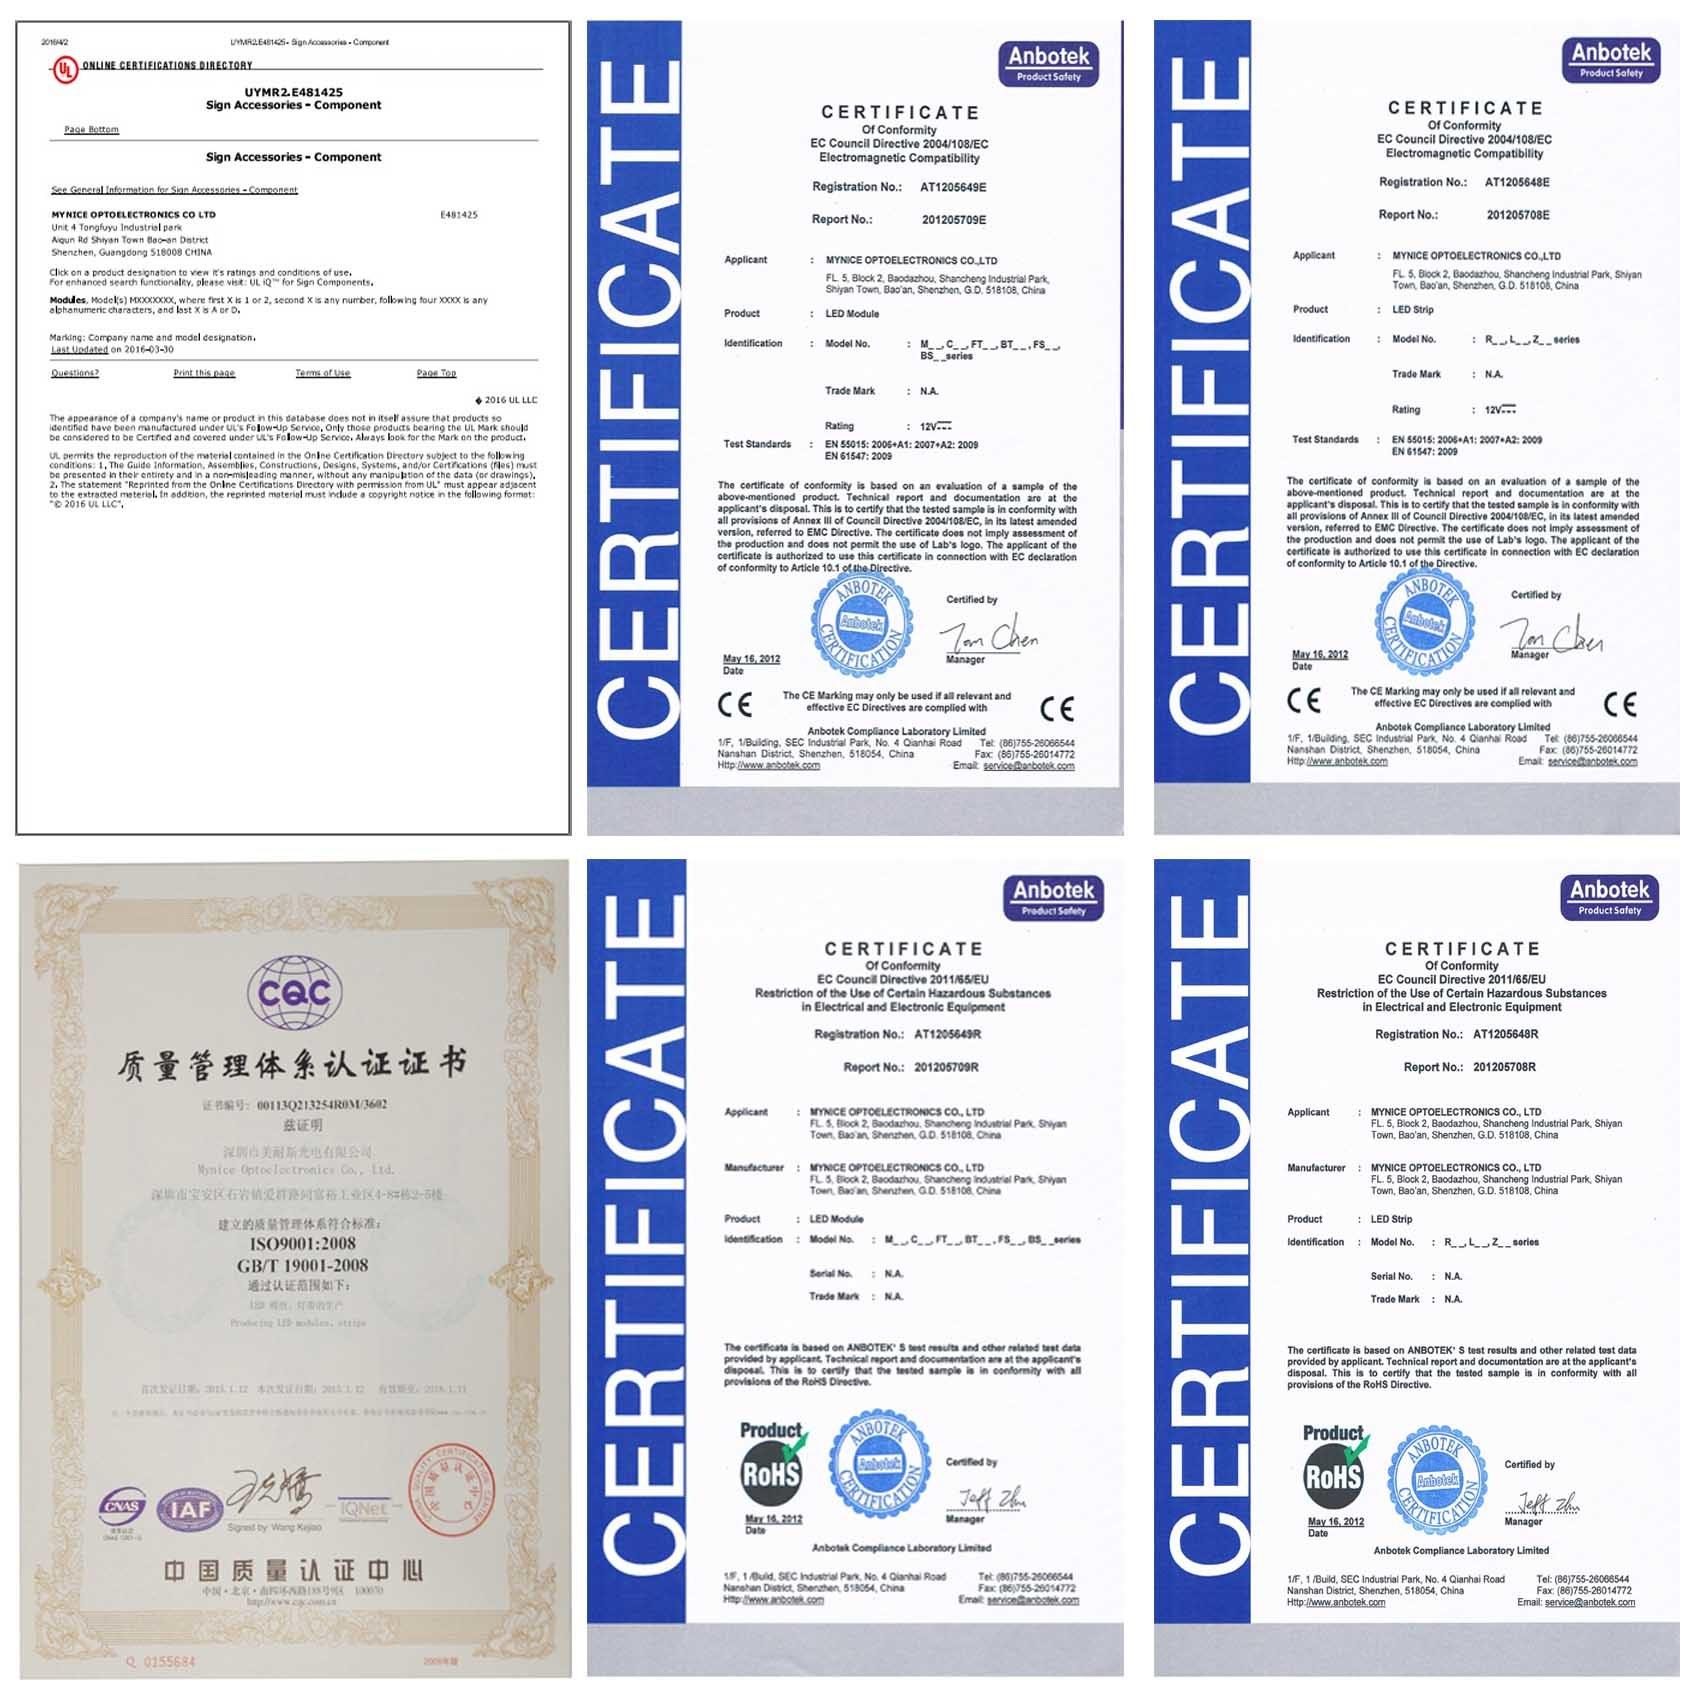 Osram 3030 DC24V High Brightness LED Rigid Bar with Ce RoHS UL Certificates 3 Years Warrenty